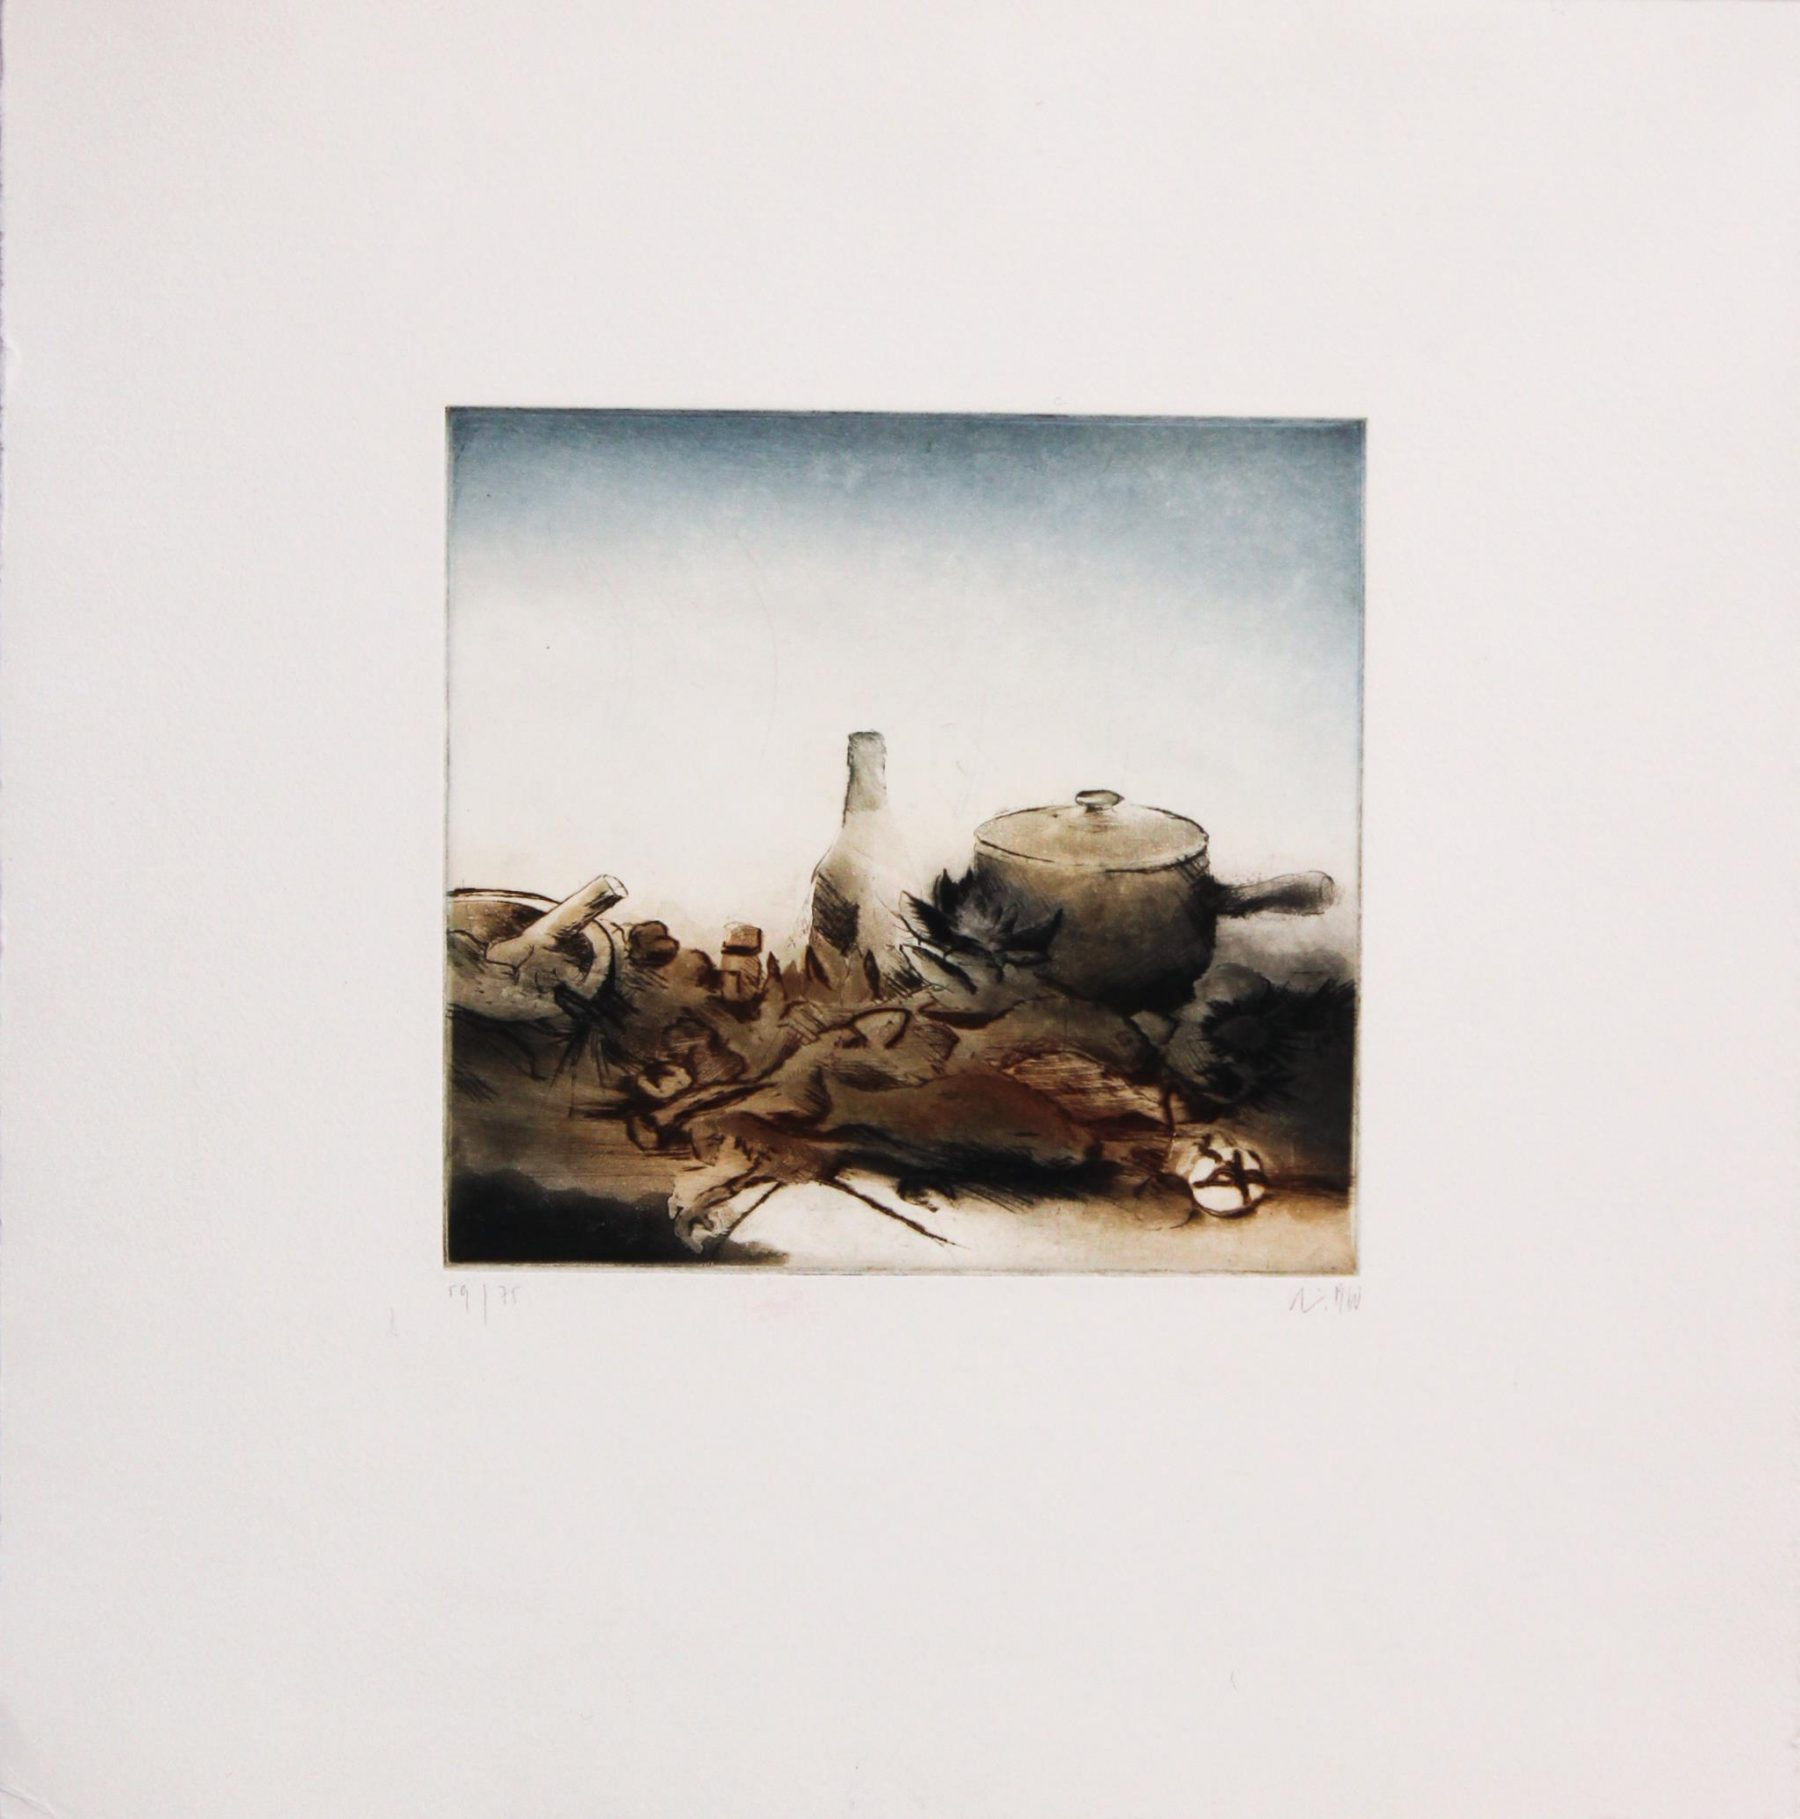 boullaba - Lichtner-Aix, Werner - k-03143